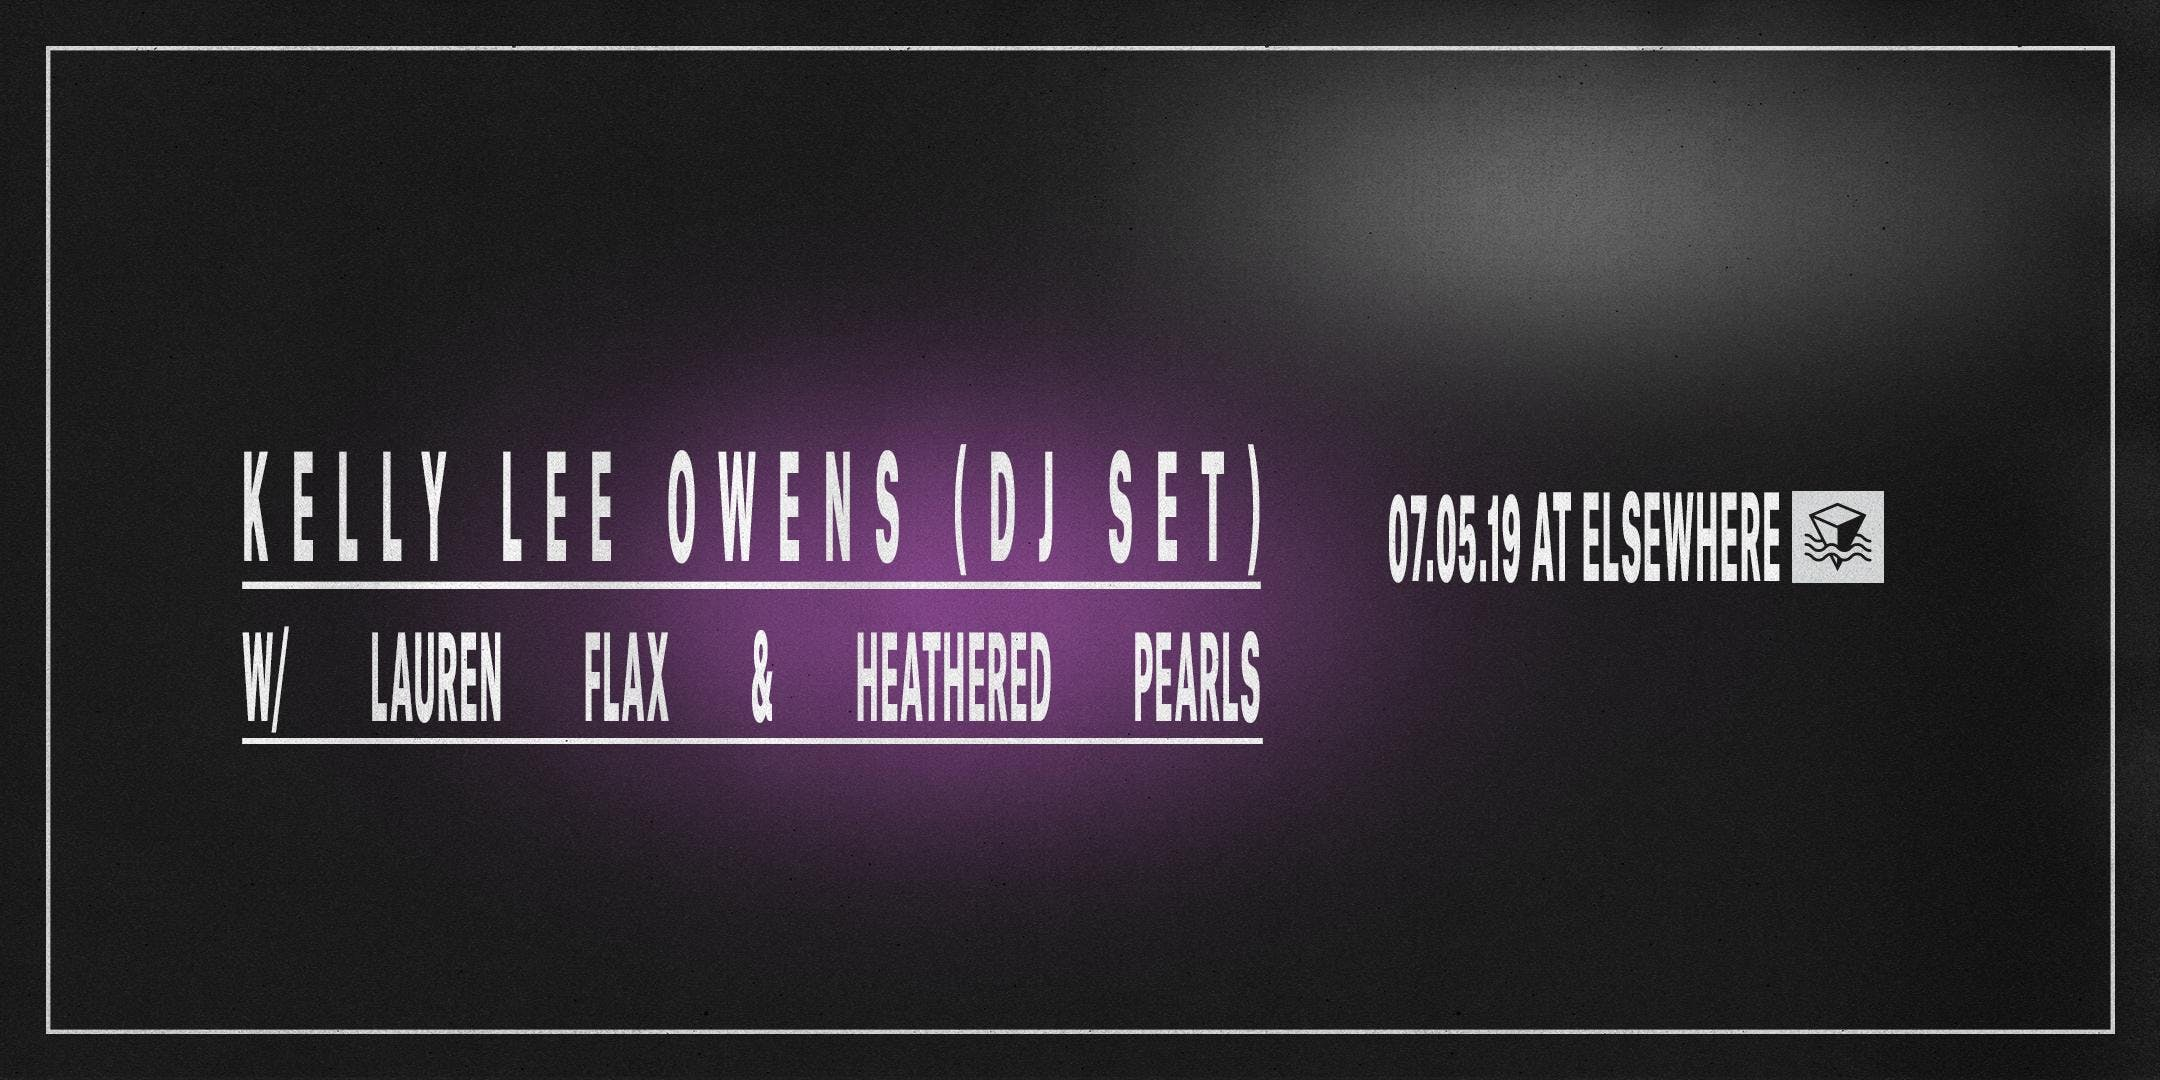 Kelly Lee Owens (DJ Set), Lauren Flax & Heathered Pearls